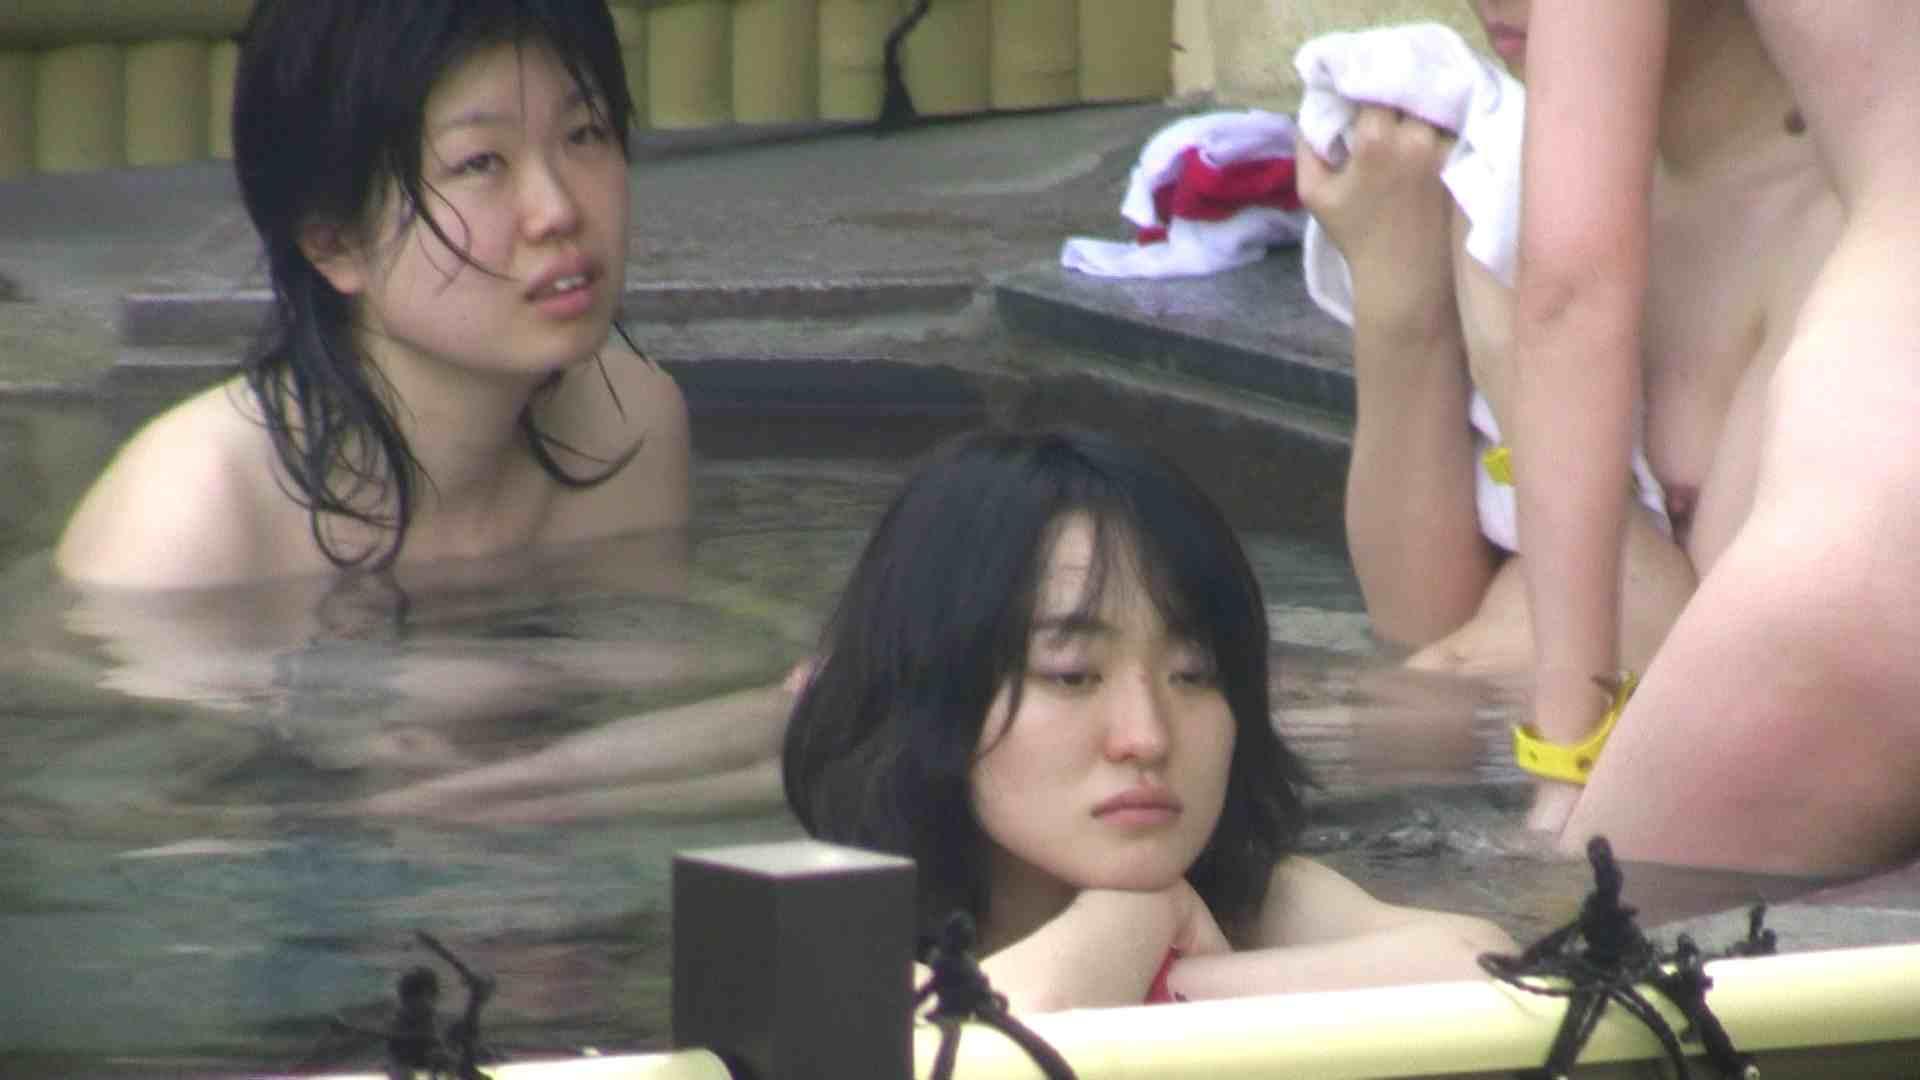 Aquaな露天風呂Vol.681 露天風呂 戯れ無修正画像 63連発 5